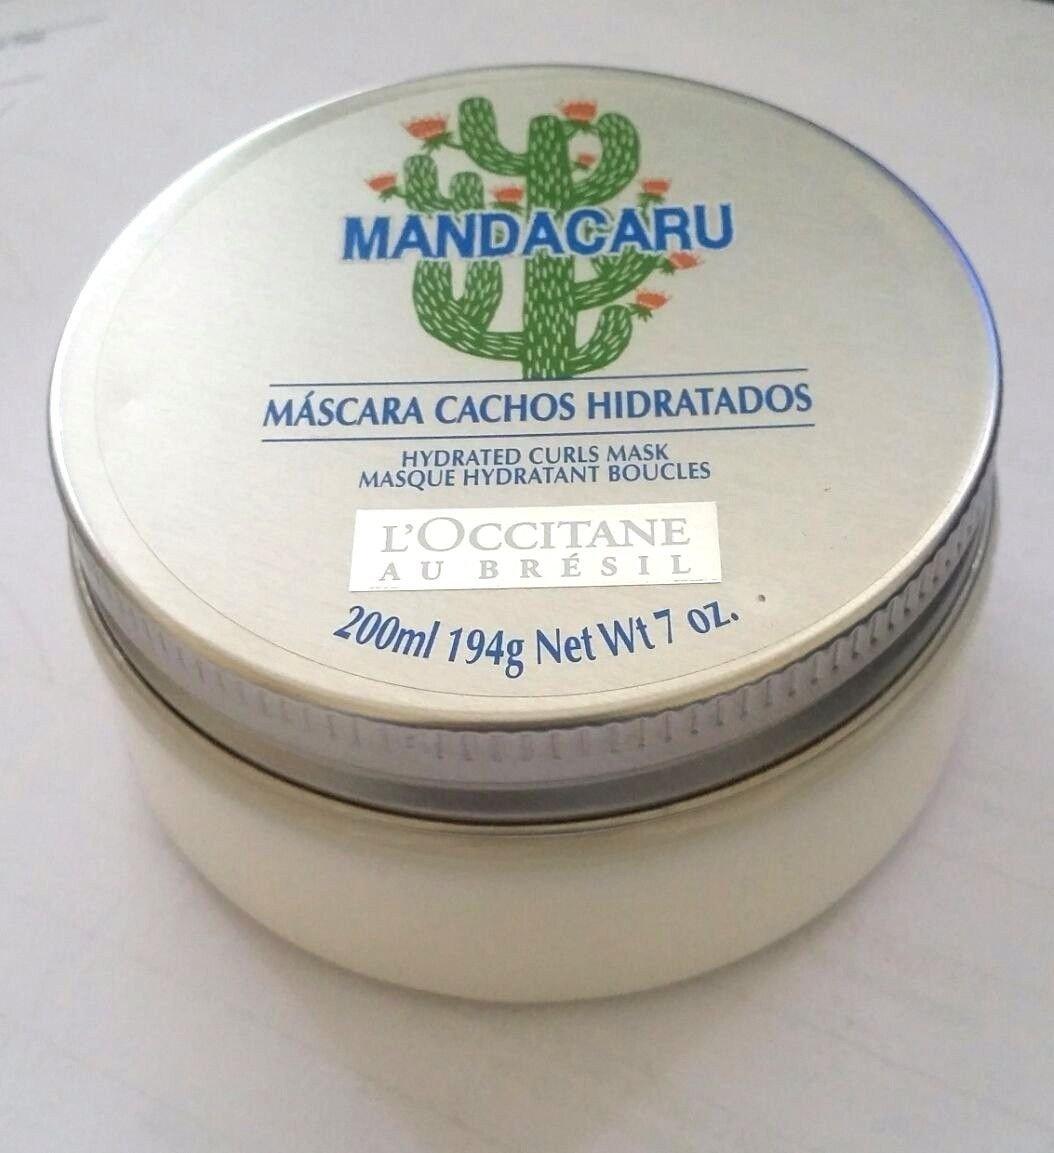 dfd45ba0265 L'Occitane Au Bresil Mandacaru Exfoliating Foot Scrub Cream 75ml by  L'Occitane - Shop Online for Beauty in New Zealand